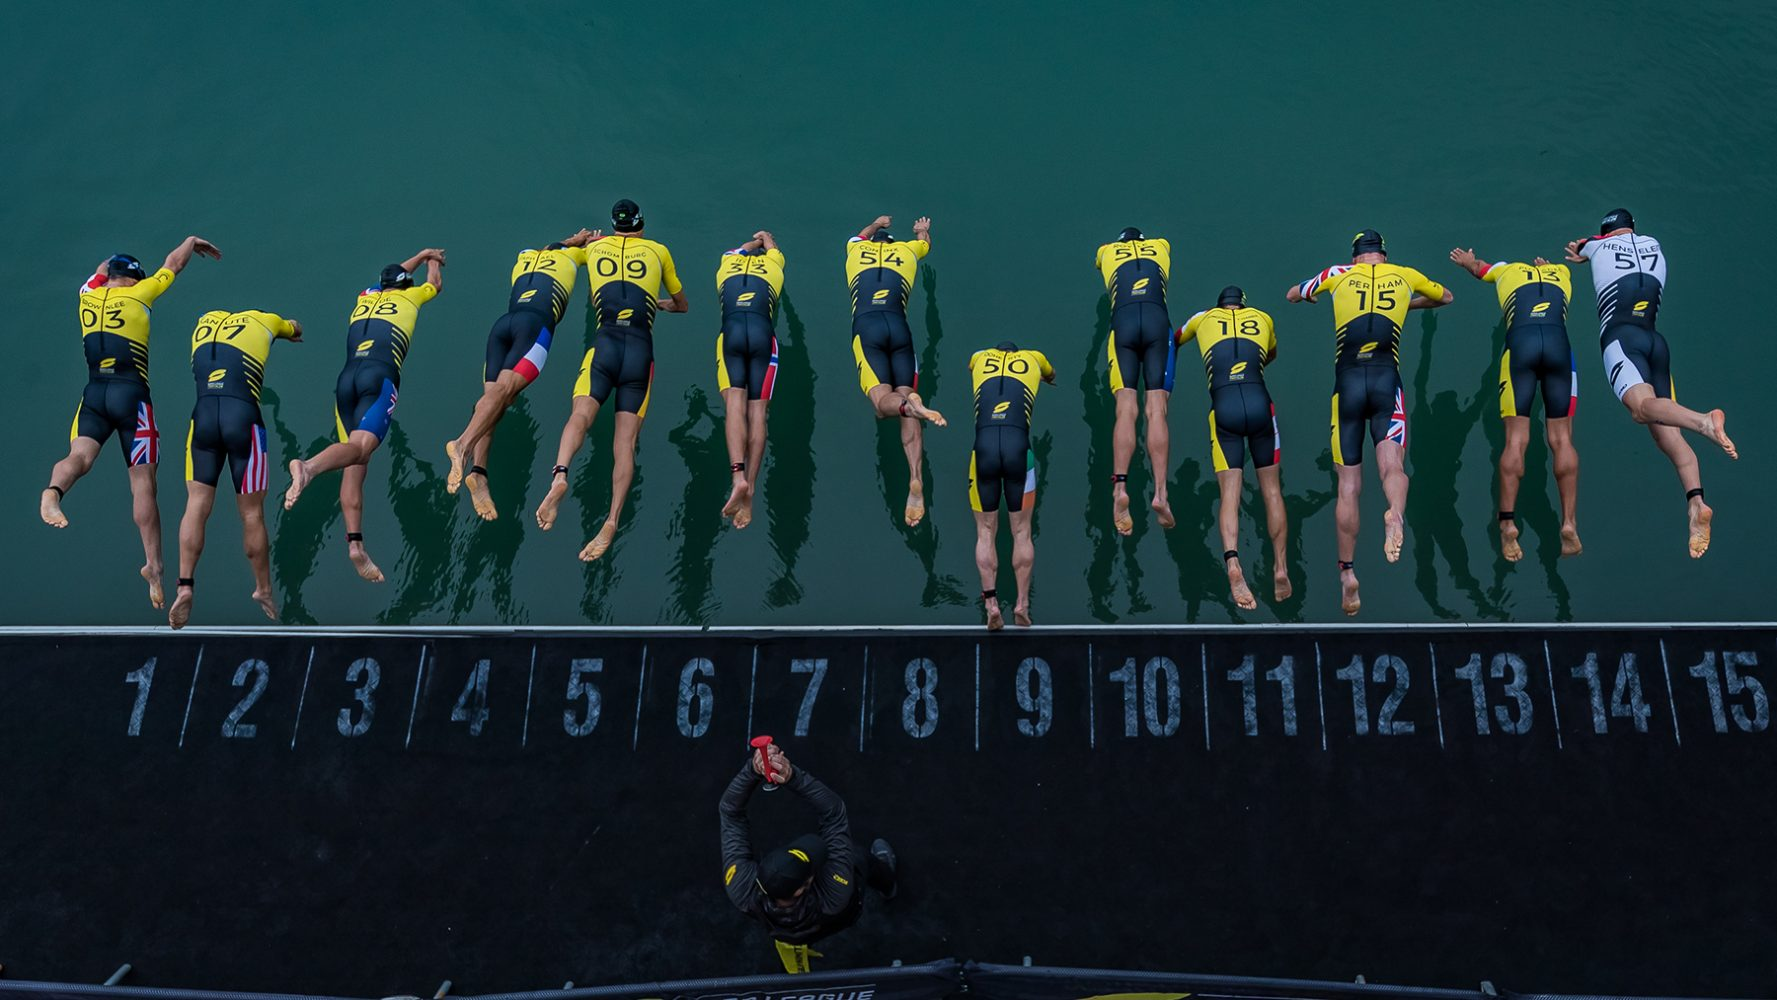 Super League Triathlon 2021 Championship Series